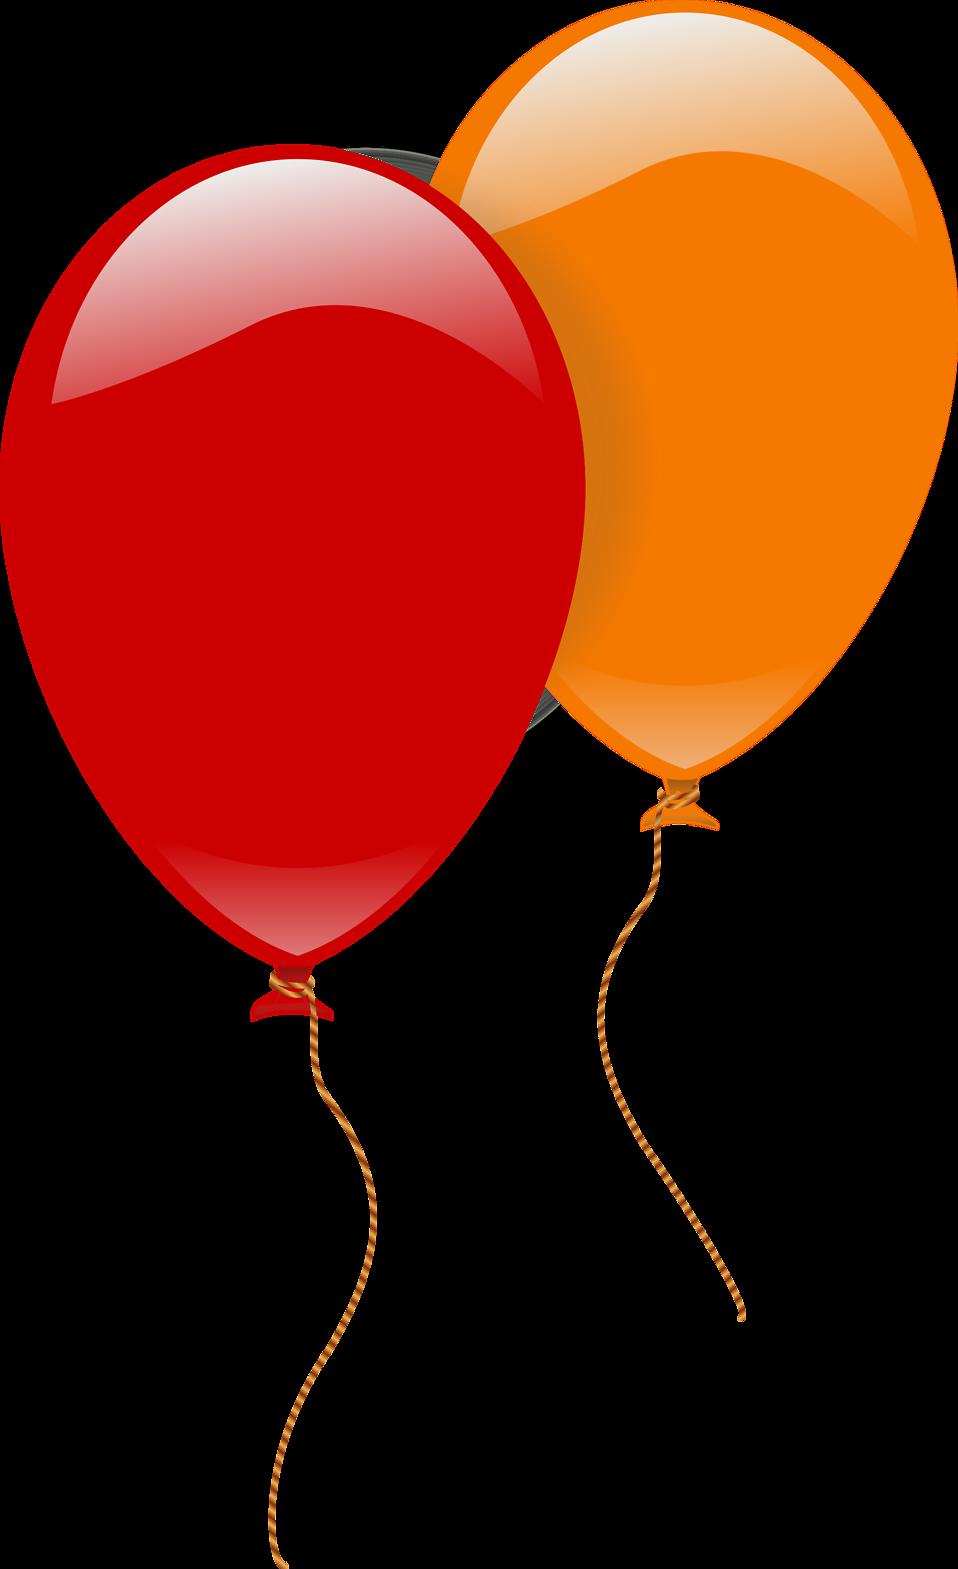 Clipart tent balloon. Balloons free stock photo